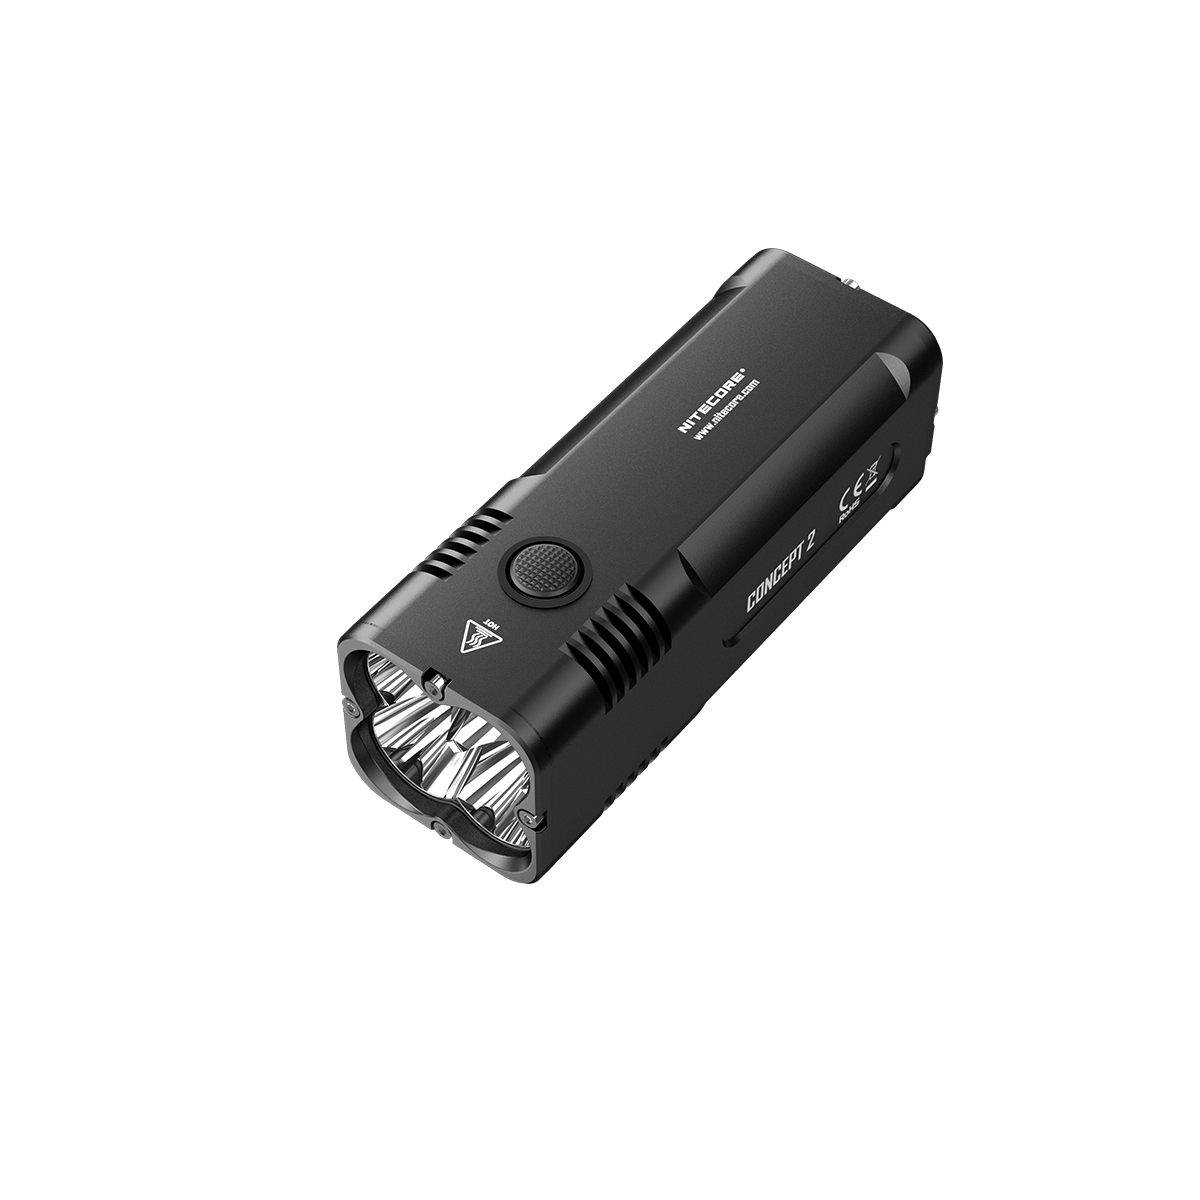 Outdoor Taschenlampe 4x CREE XHP35 HD LED 6500 Lumen 398m Nitecore Concept 2